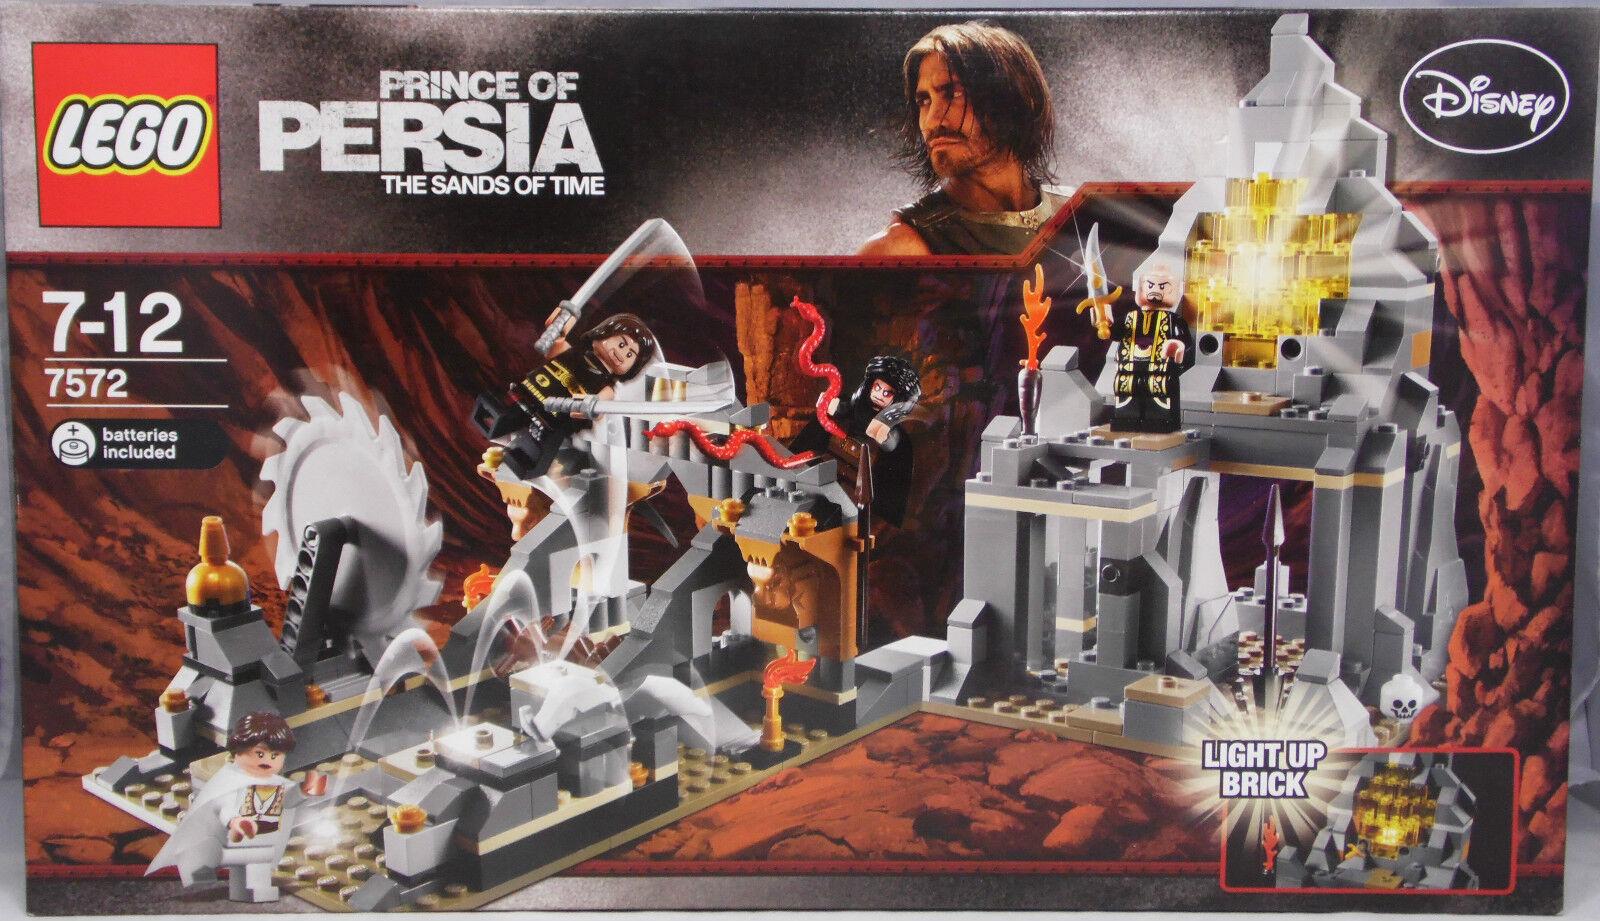 Lego Prince of Persia 7572 7572 7572  Kampf gegen die Zeit Dastan Light Brick NEU 127aa9